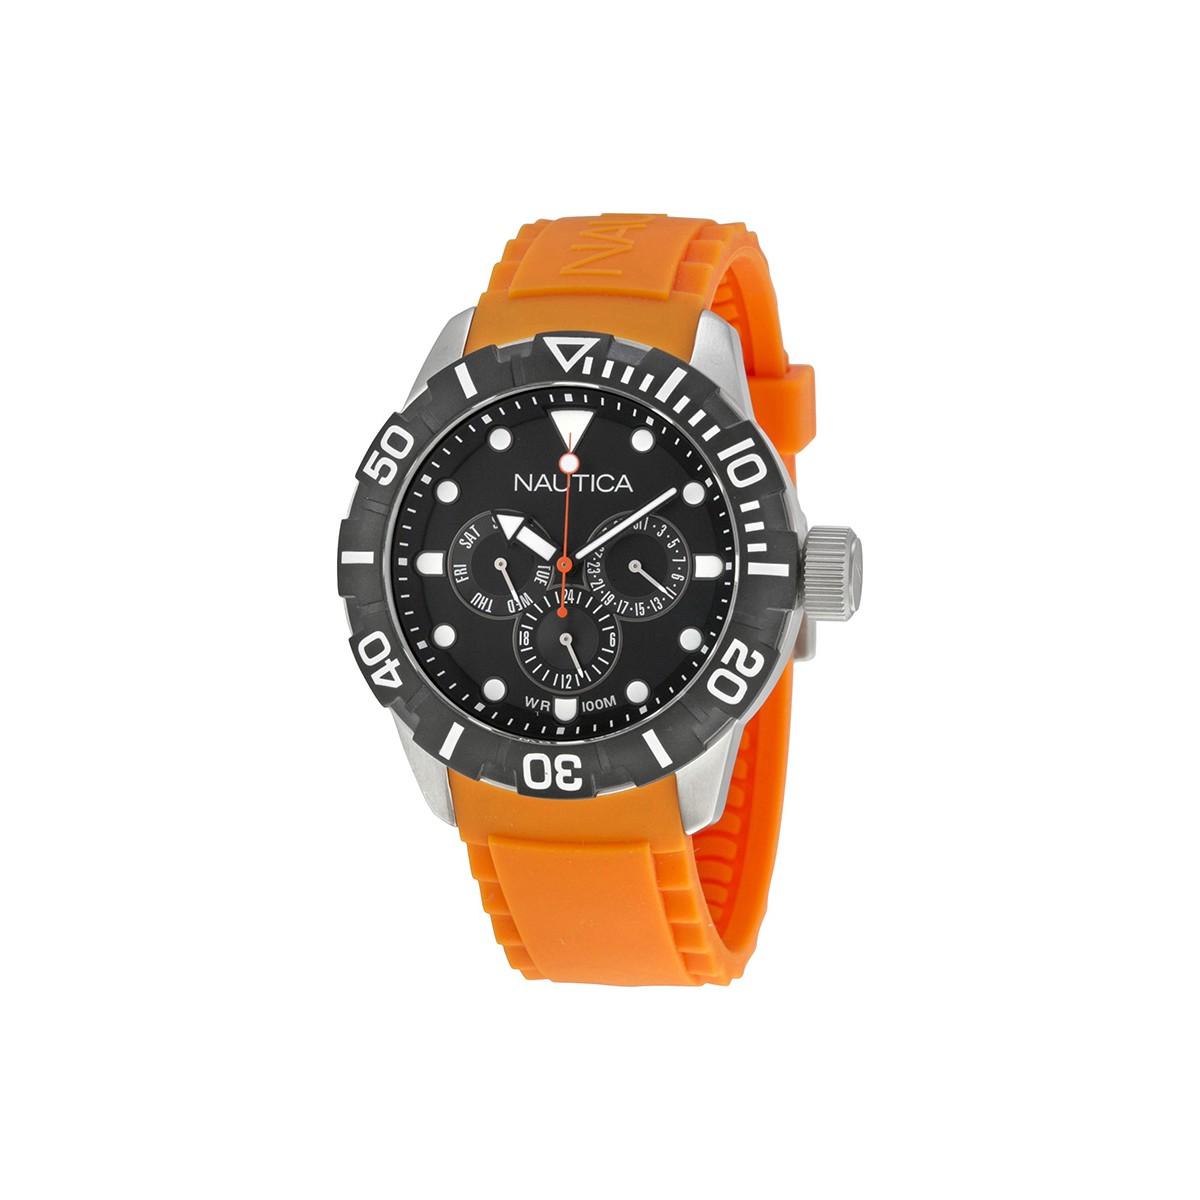 https://www.gaberjoyeria.com/2933-thickbox_default/reloj-nautica-n13646g.jpg